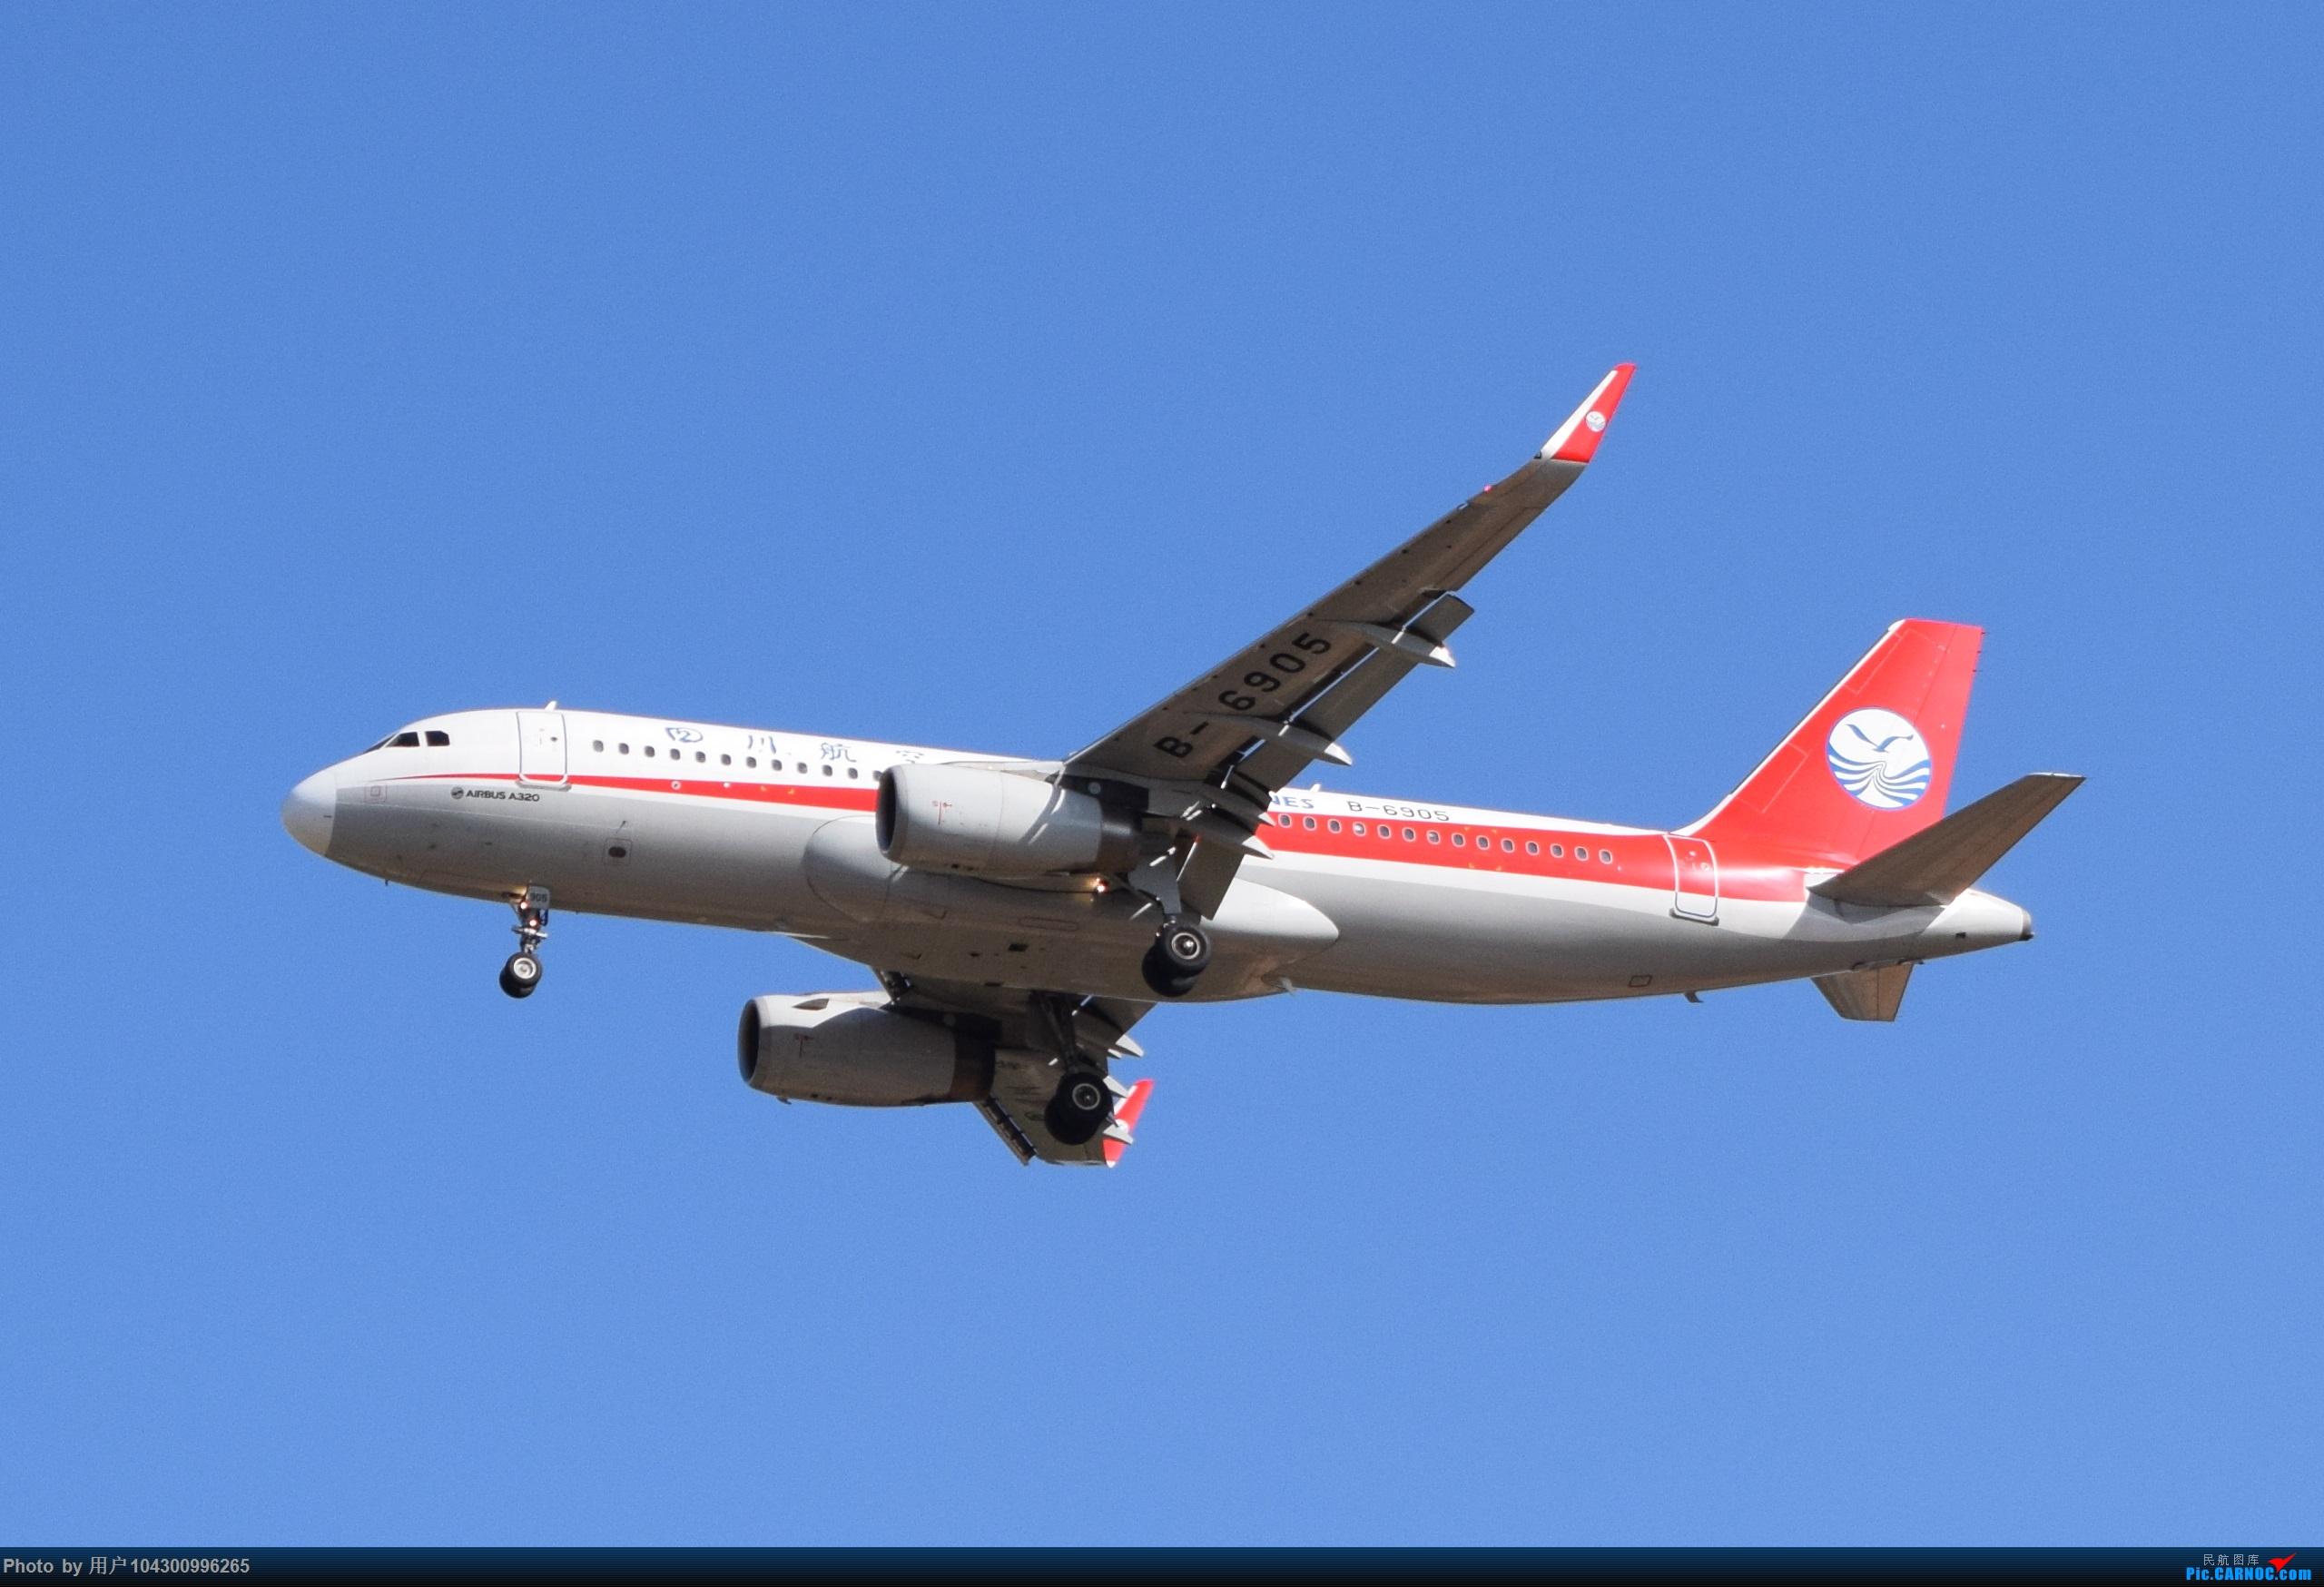 Re:[原创][KWE]贵阳今天天气不错,随便拍几张! AIRBUS A320-200 B-6905 中国贵阳龙洞堡国际机场